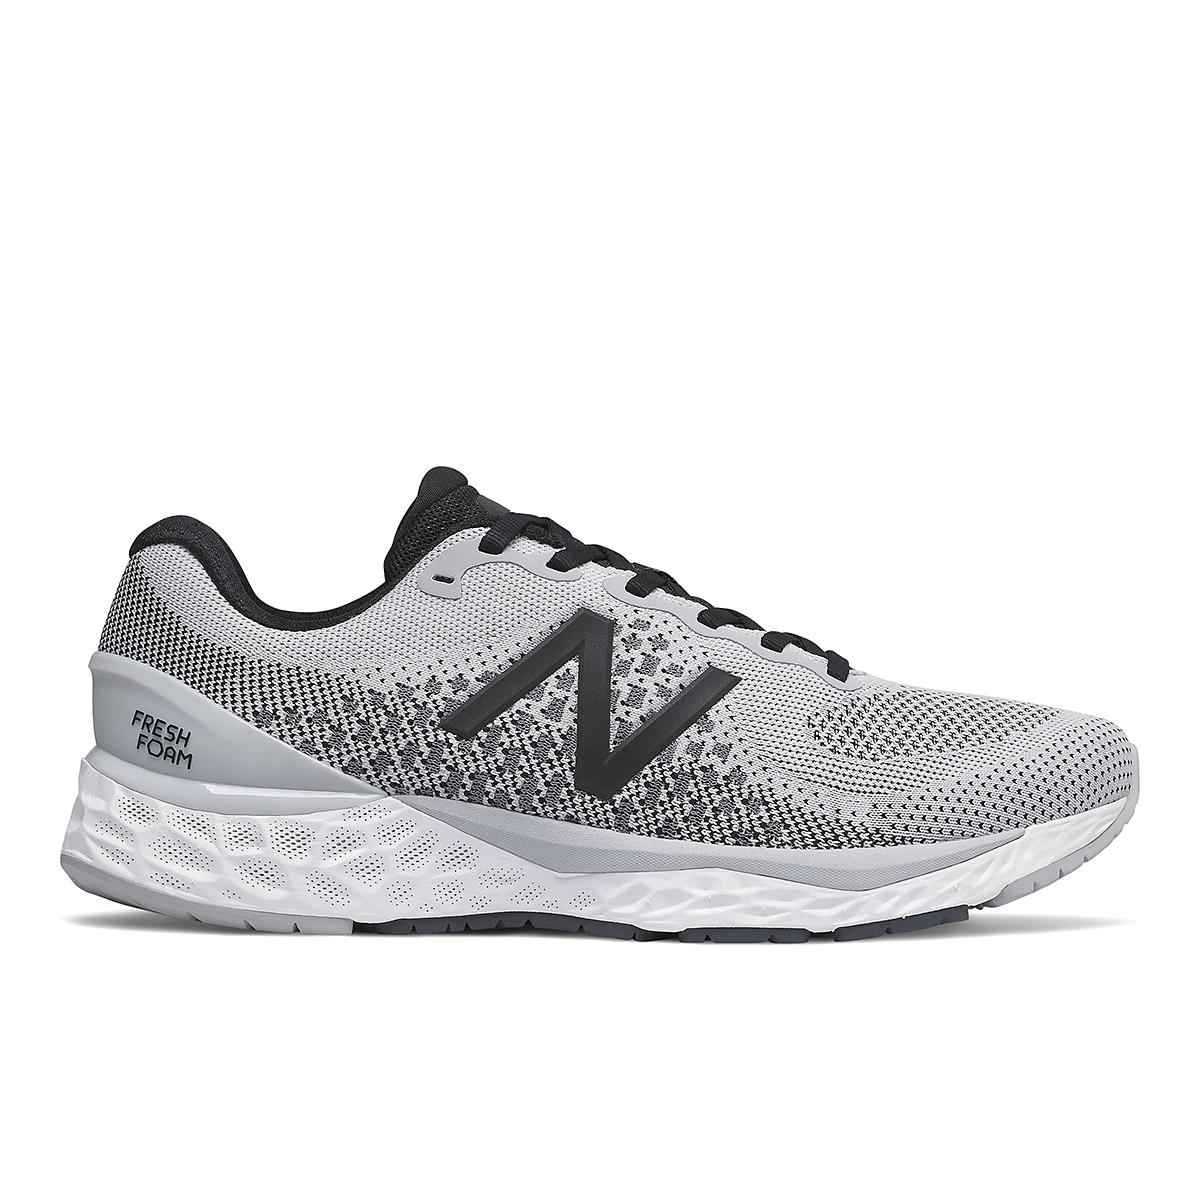 Men's New Balance 880V10 Running Shoe - Color: Light Aluminum - Size: 7 - Width: Wide, Light Aluminum, large, image 1